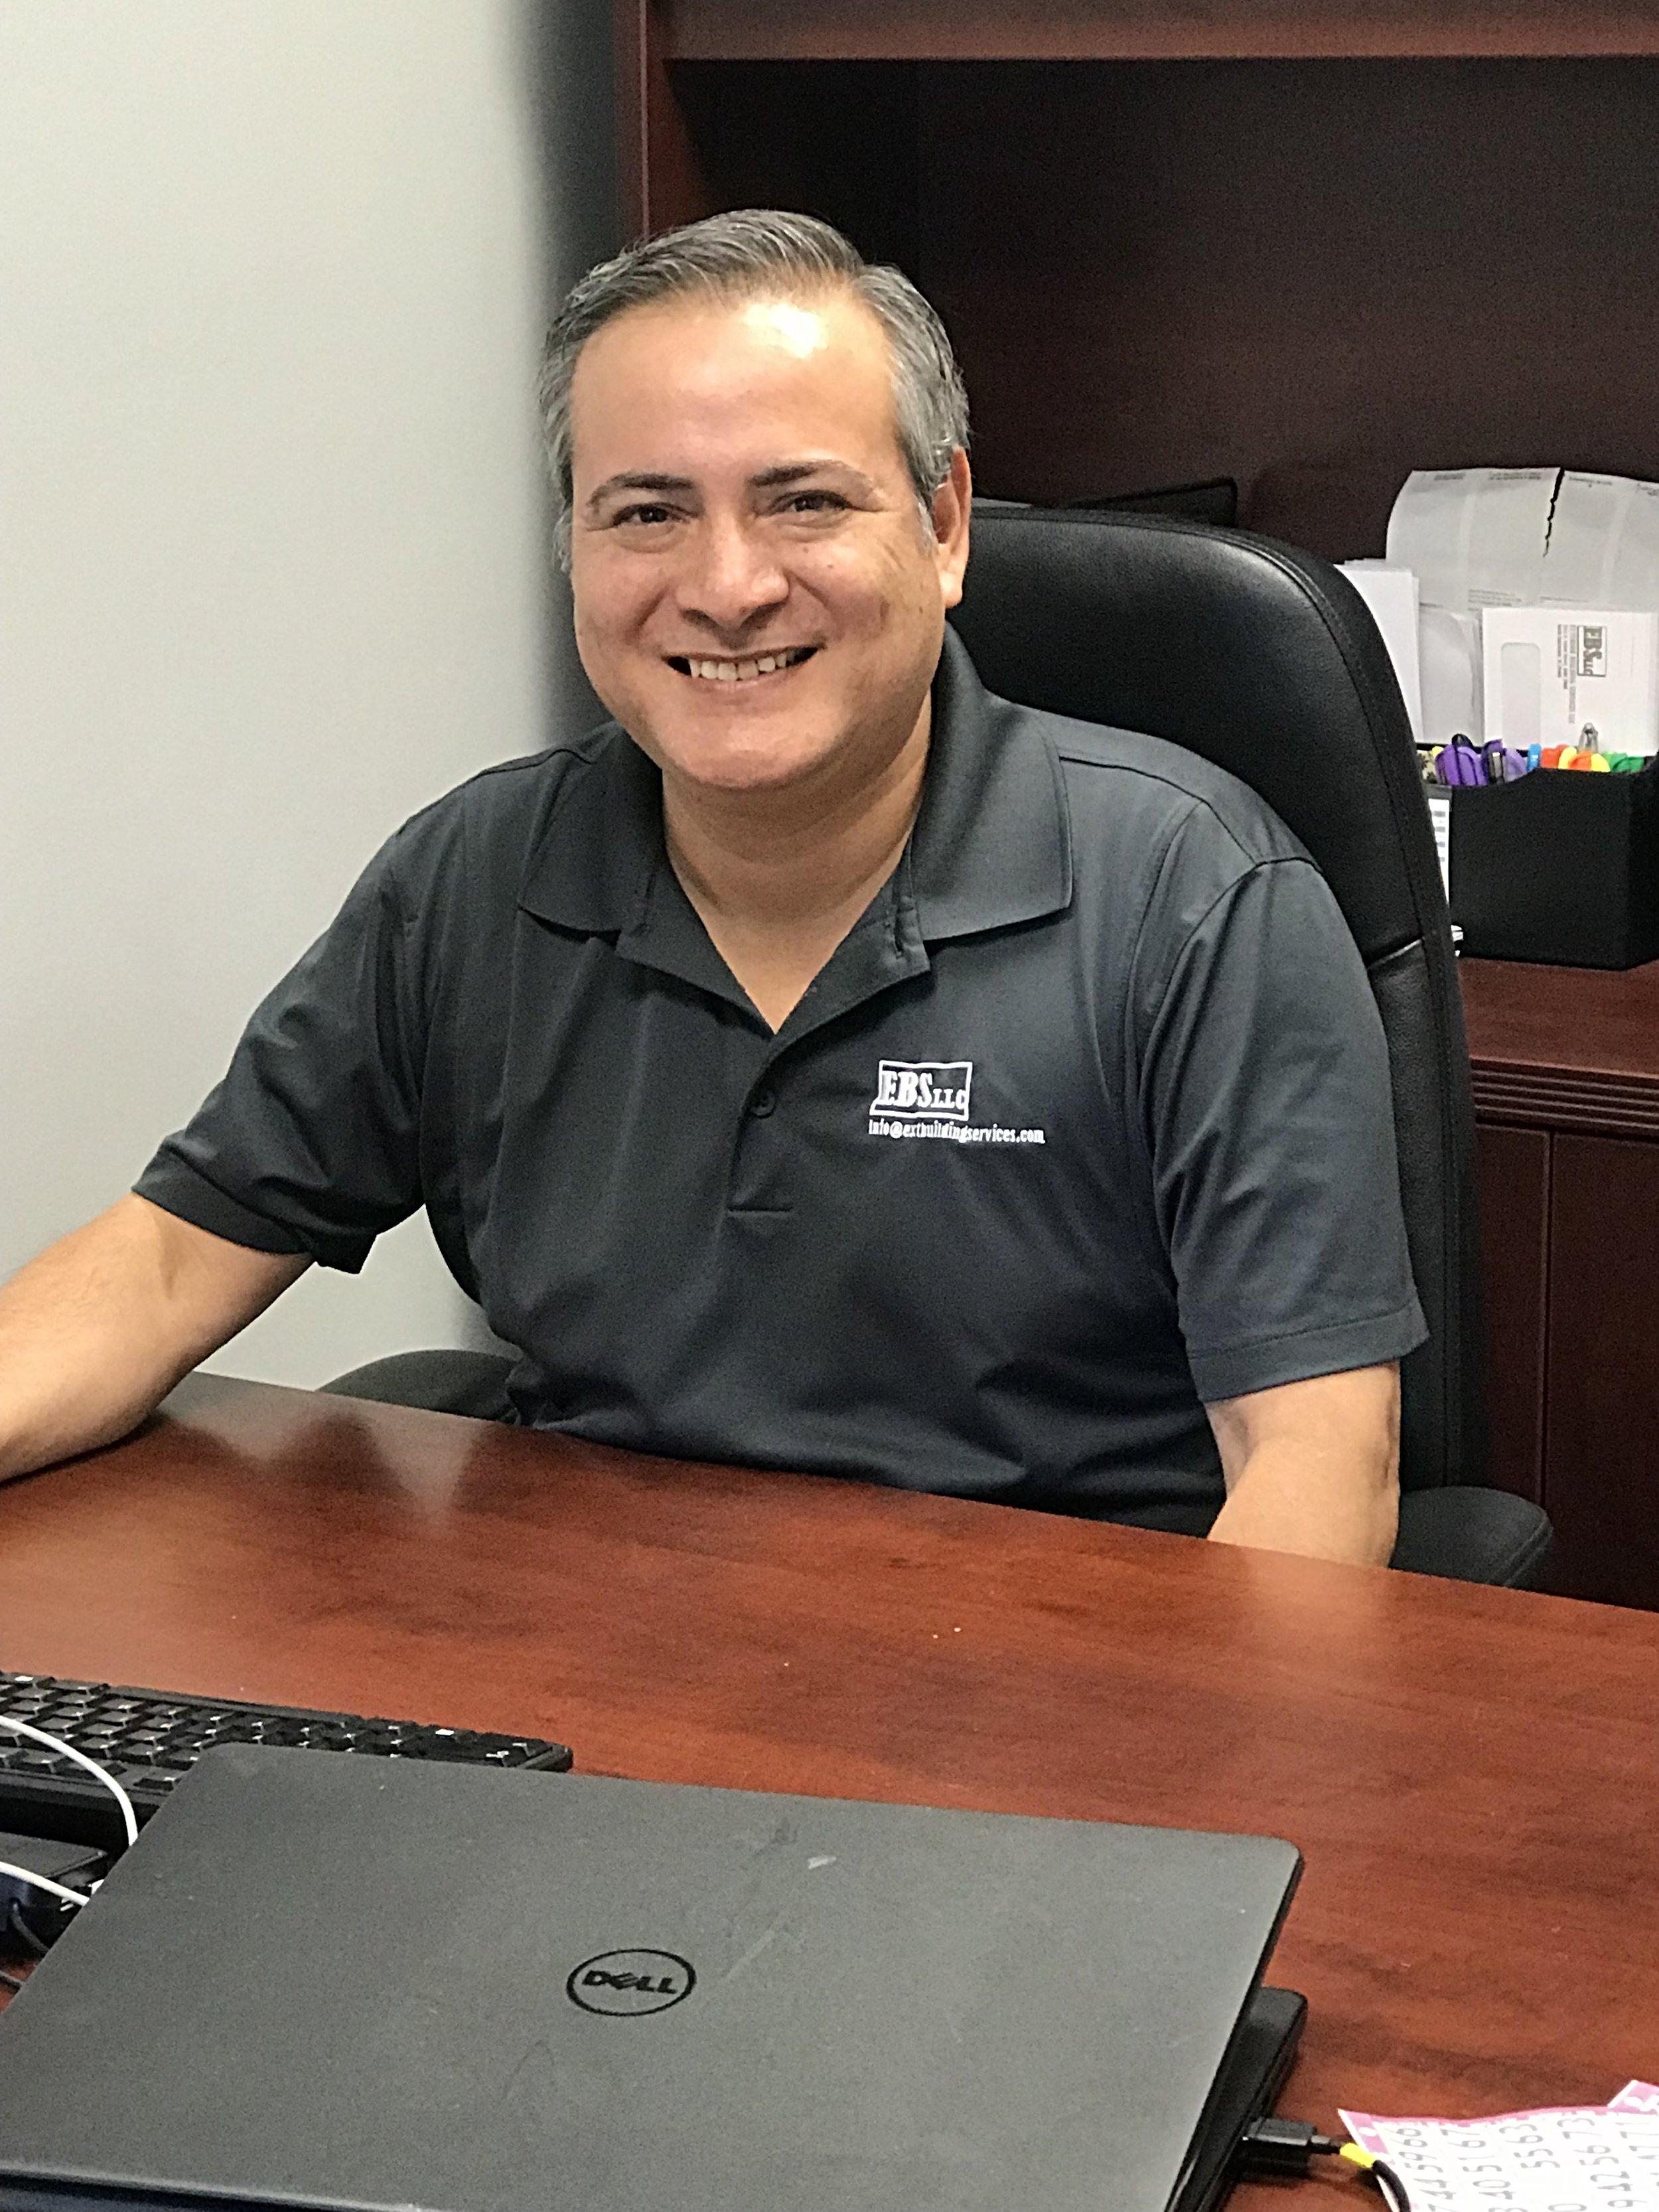 Eduardo Martinez, Head of Cost Analysis for EBS, Exterior Building Solutions